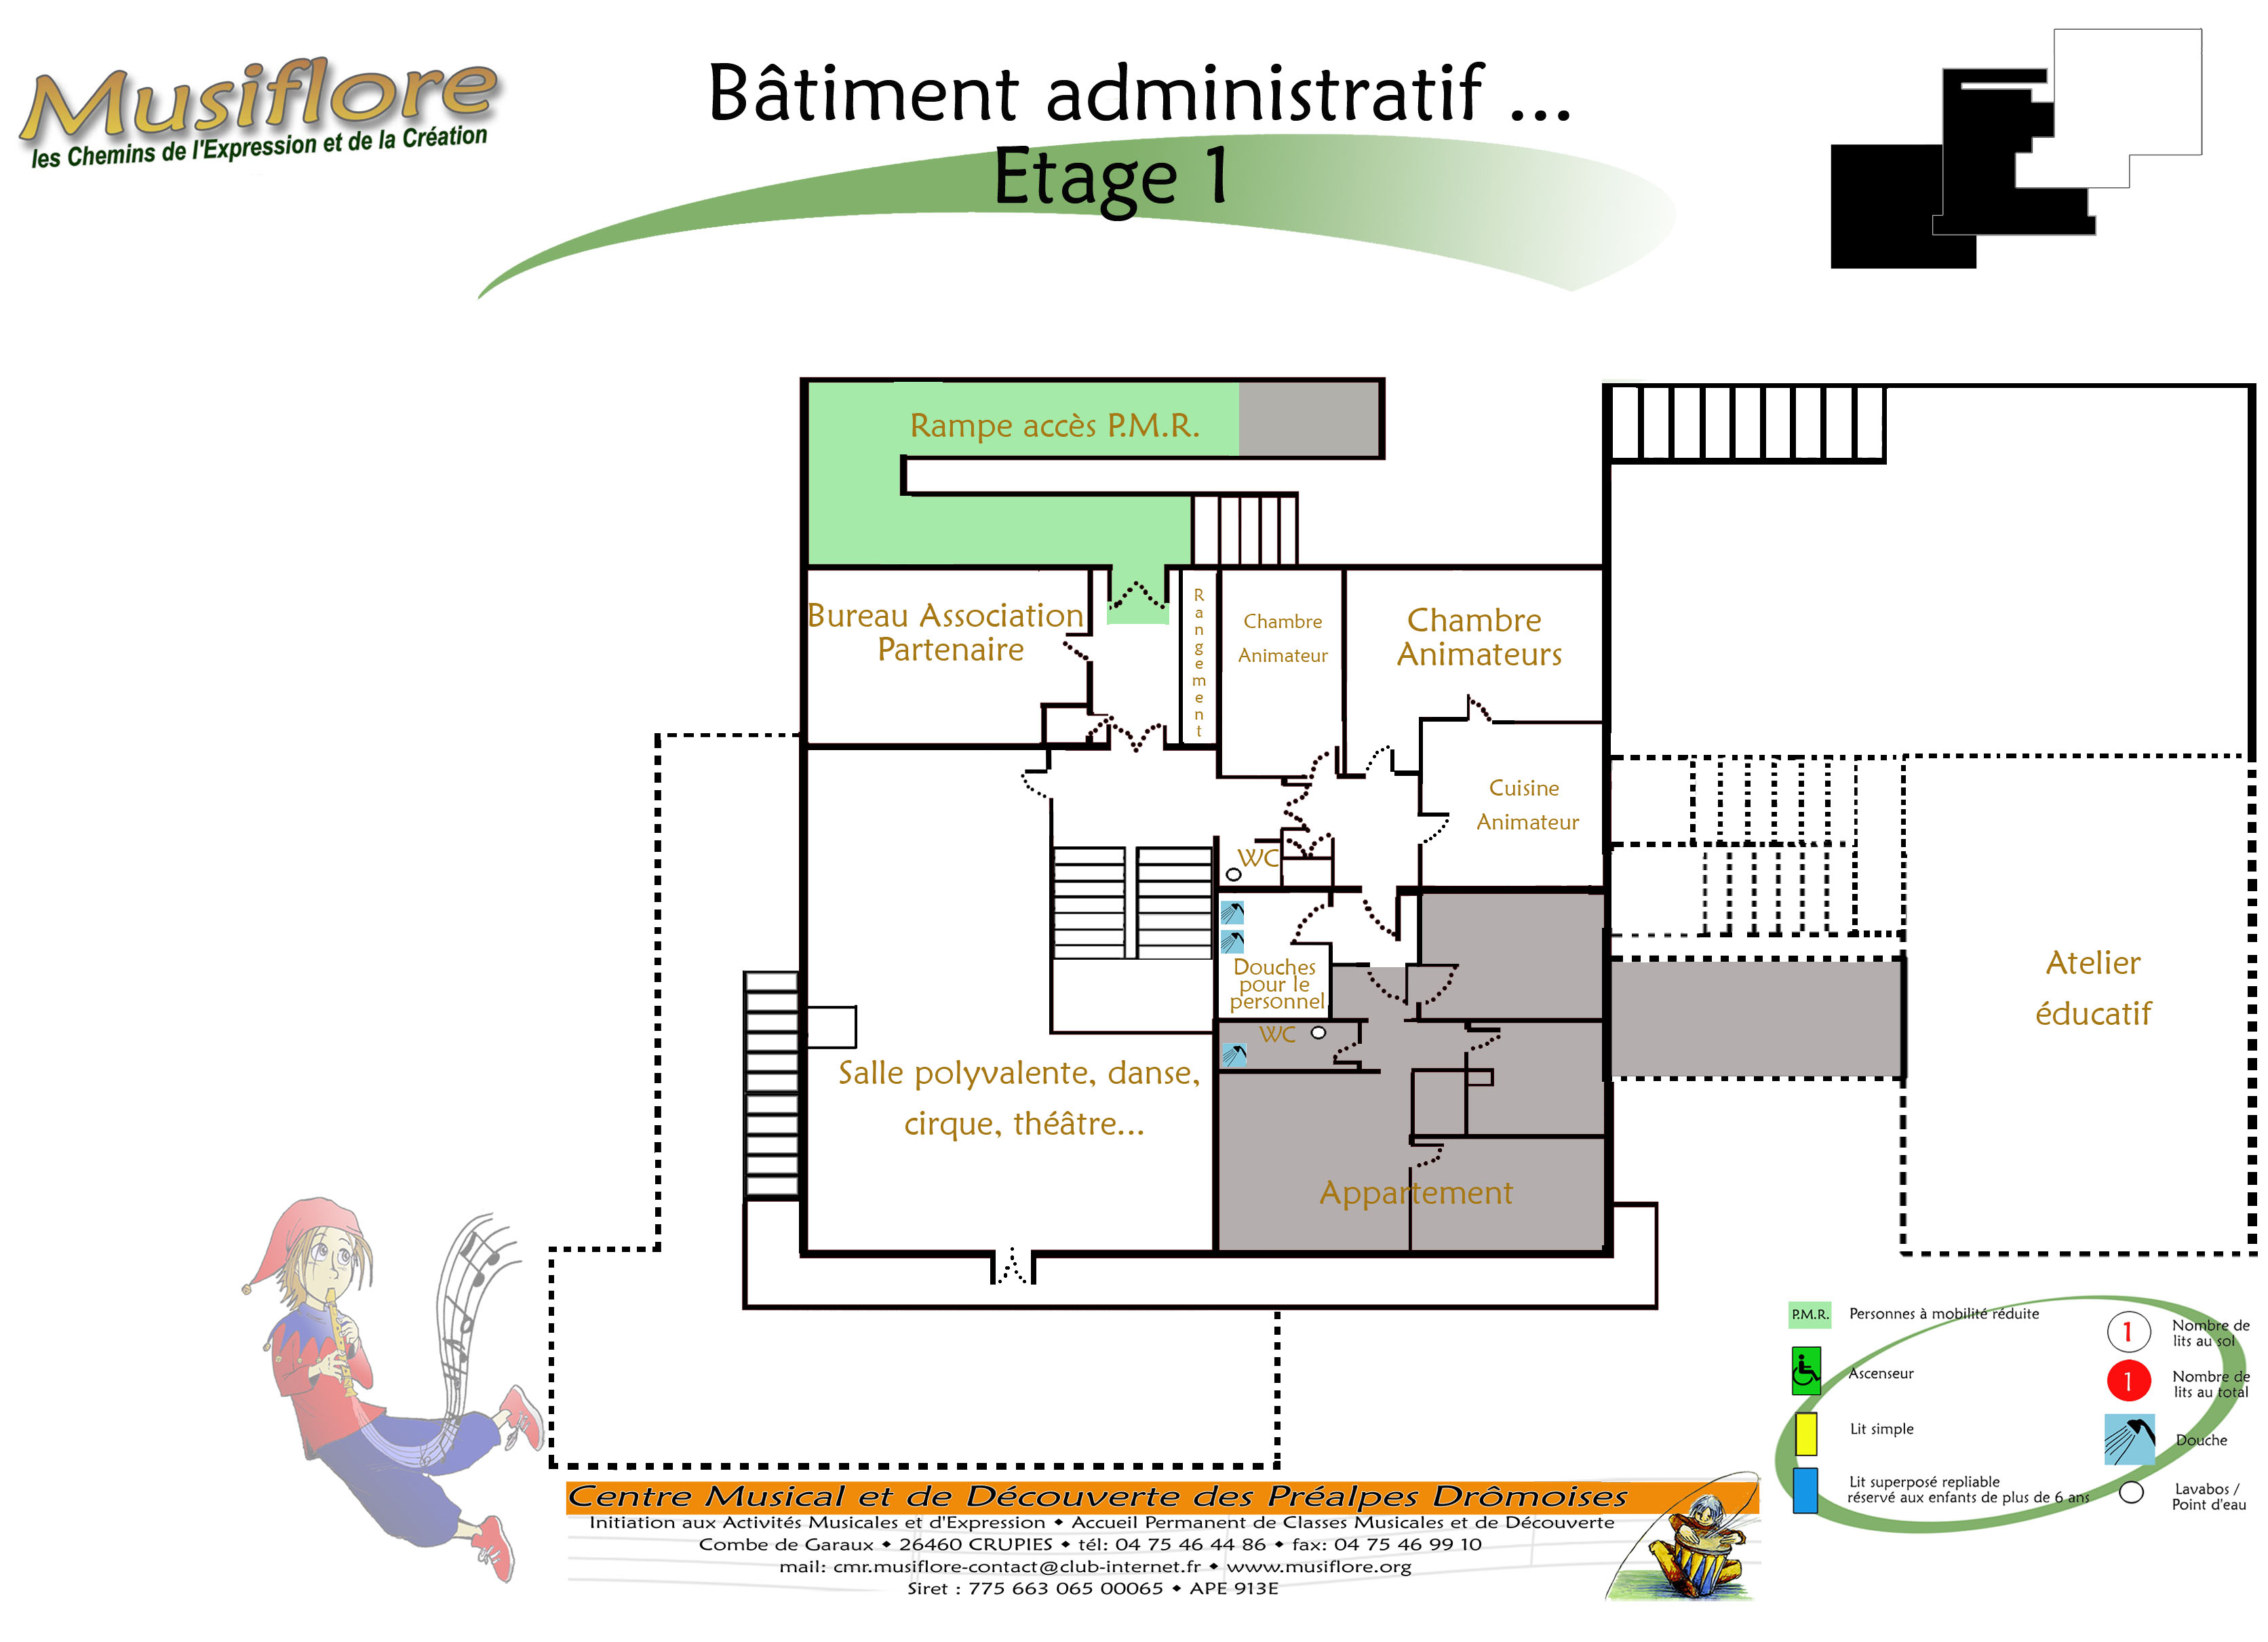 batiment-administratif-etage1